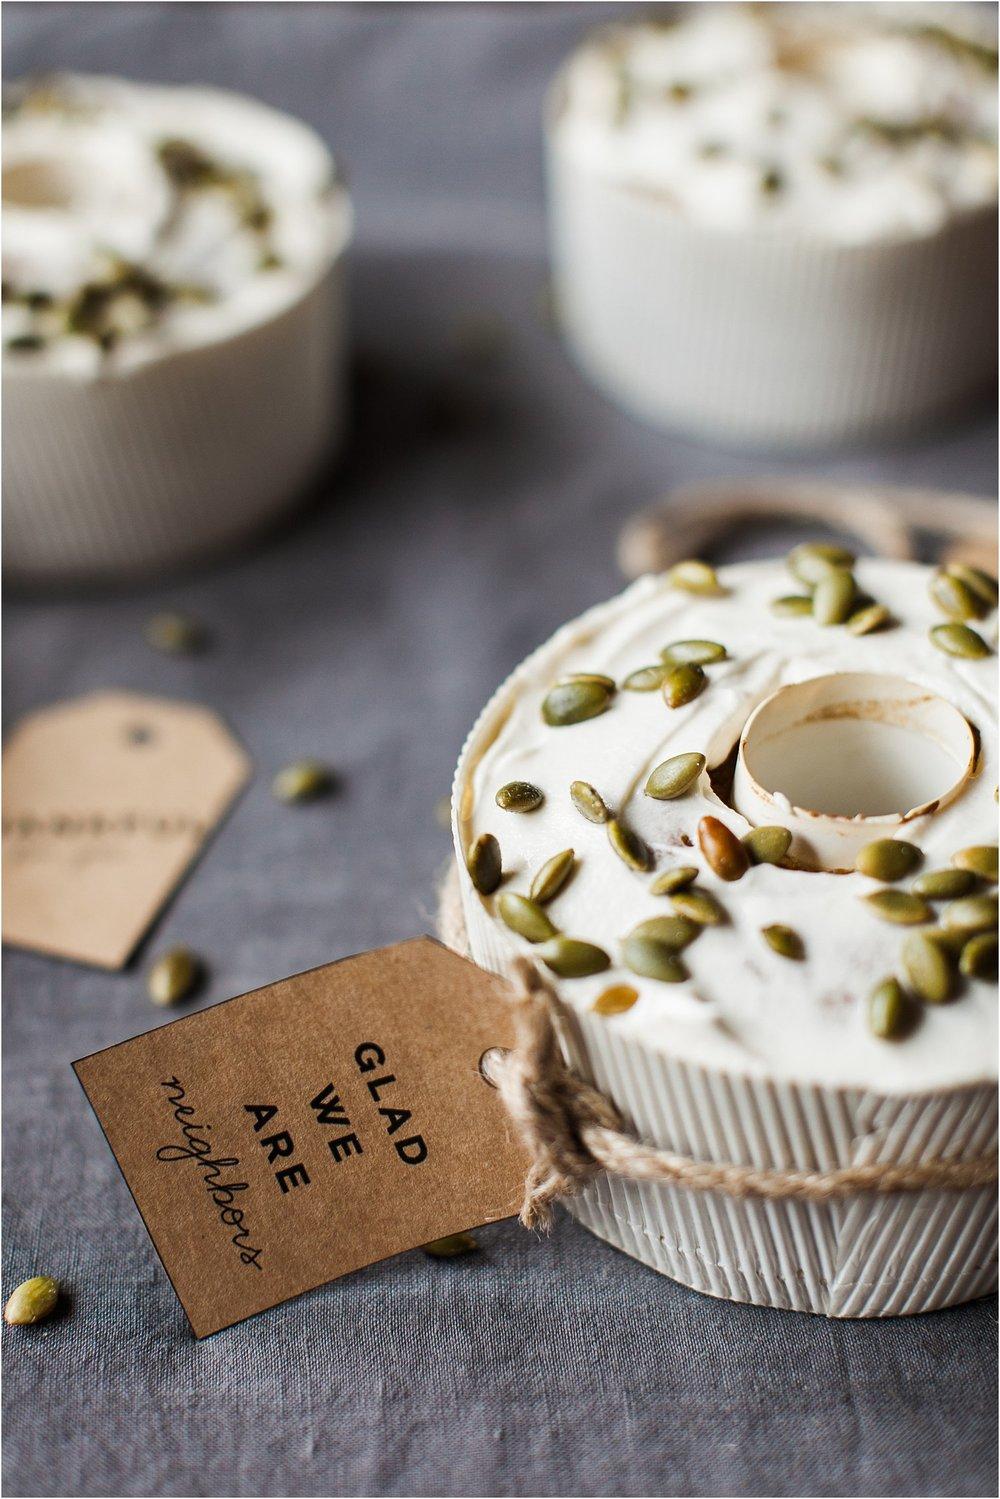 Pumpkin Spice Bundt Cakes + Tags for Neighbors | Feast & Dwell